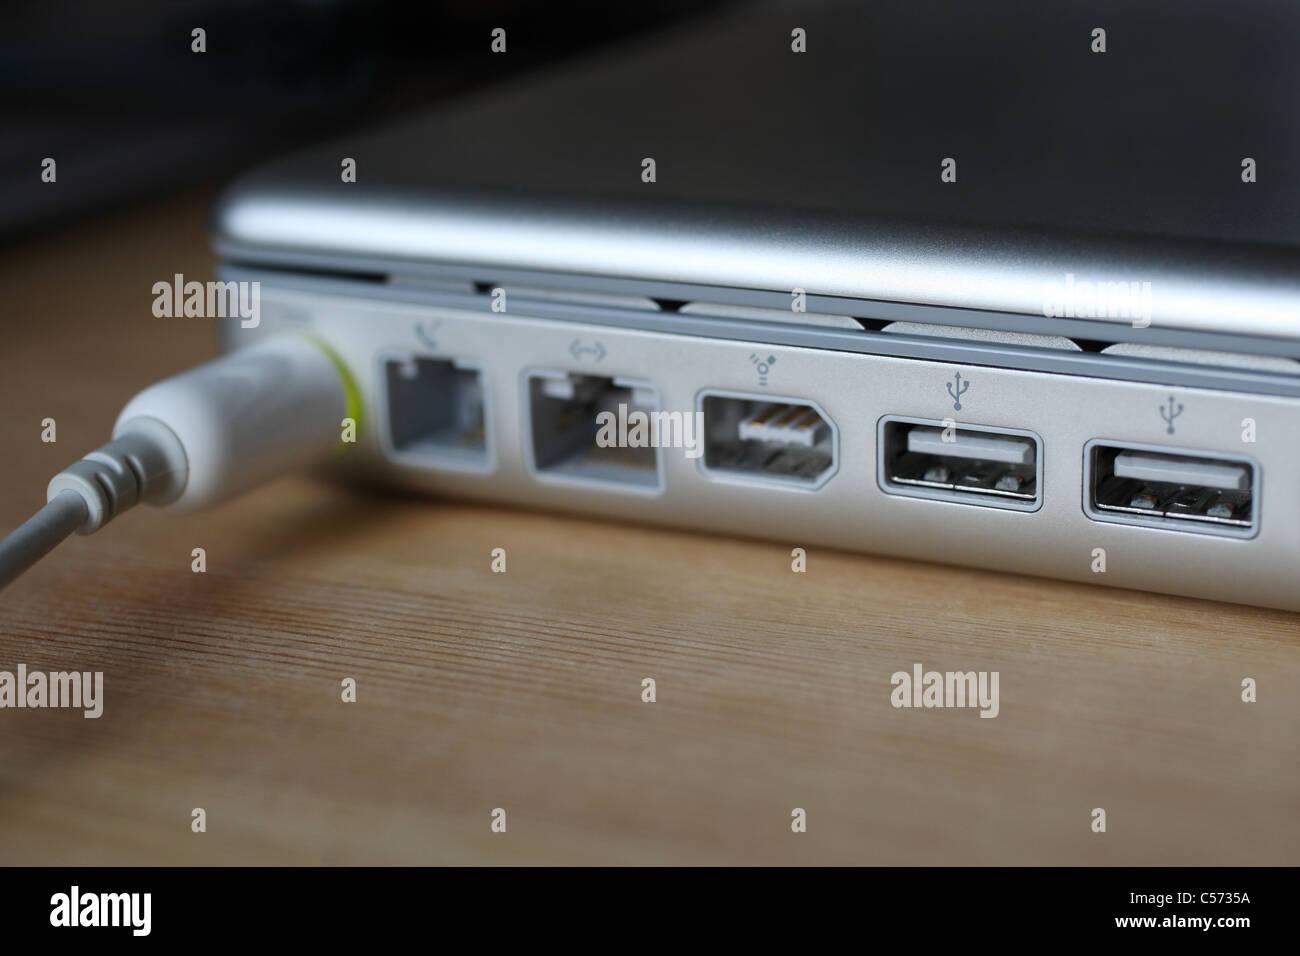 Apple PowerBook G4 Laptop USB 2.0 Ports, power adapter port Stock ...